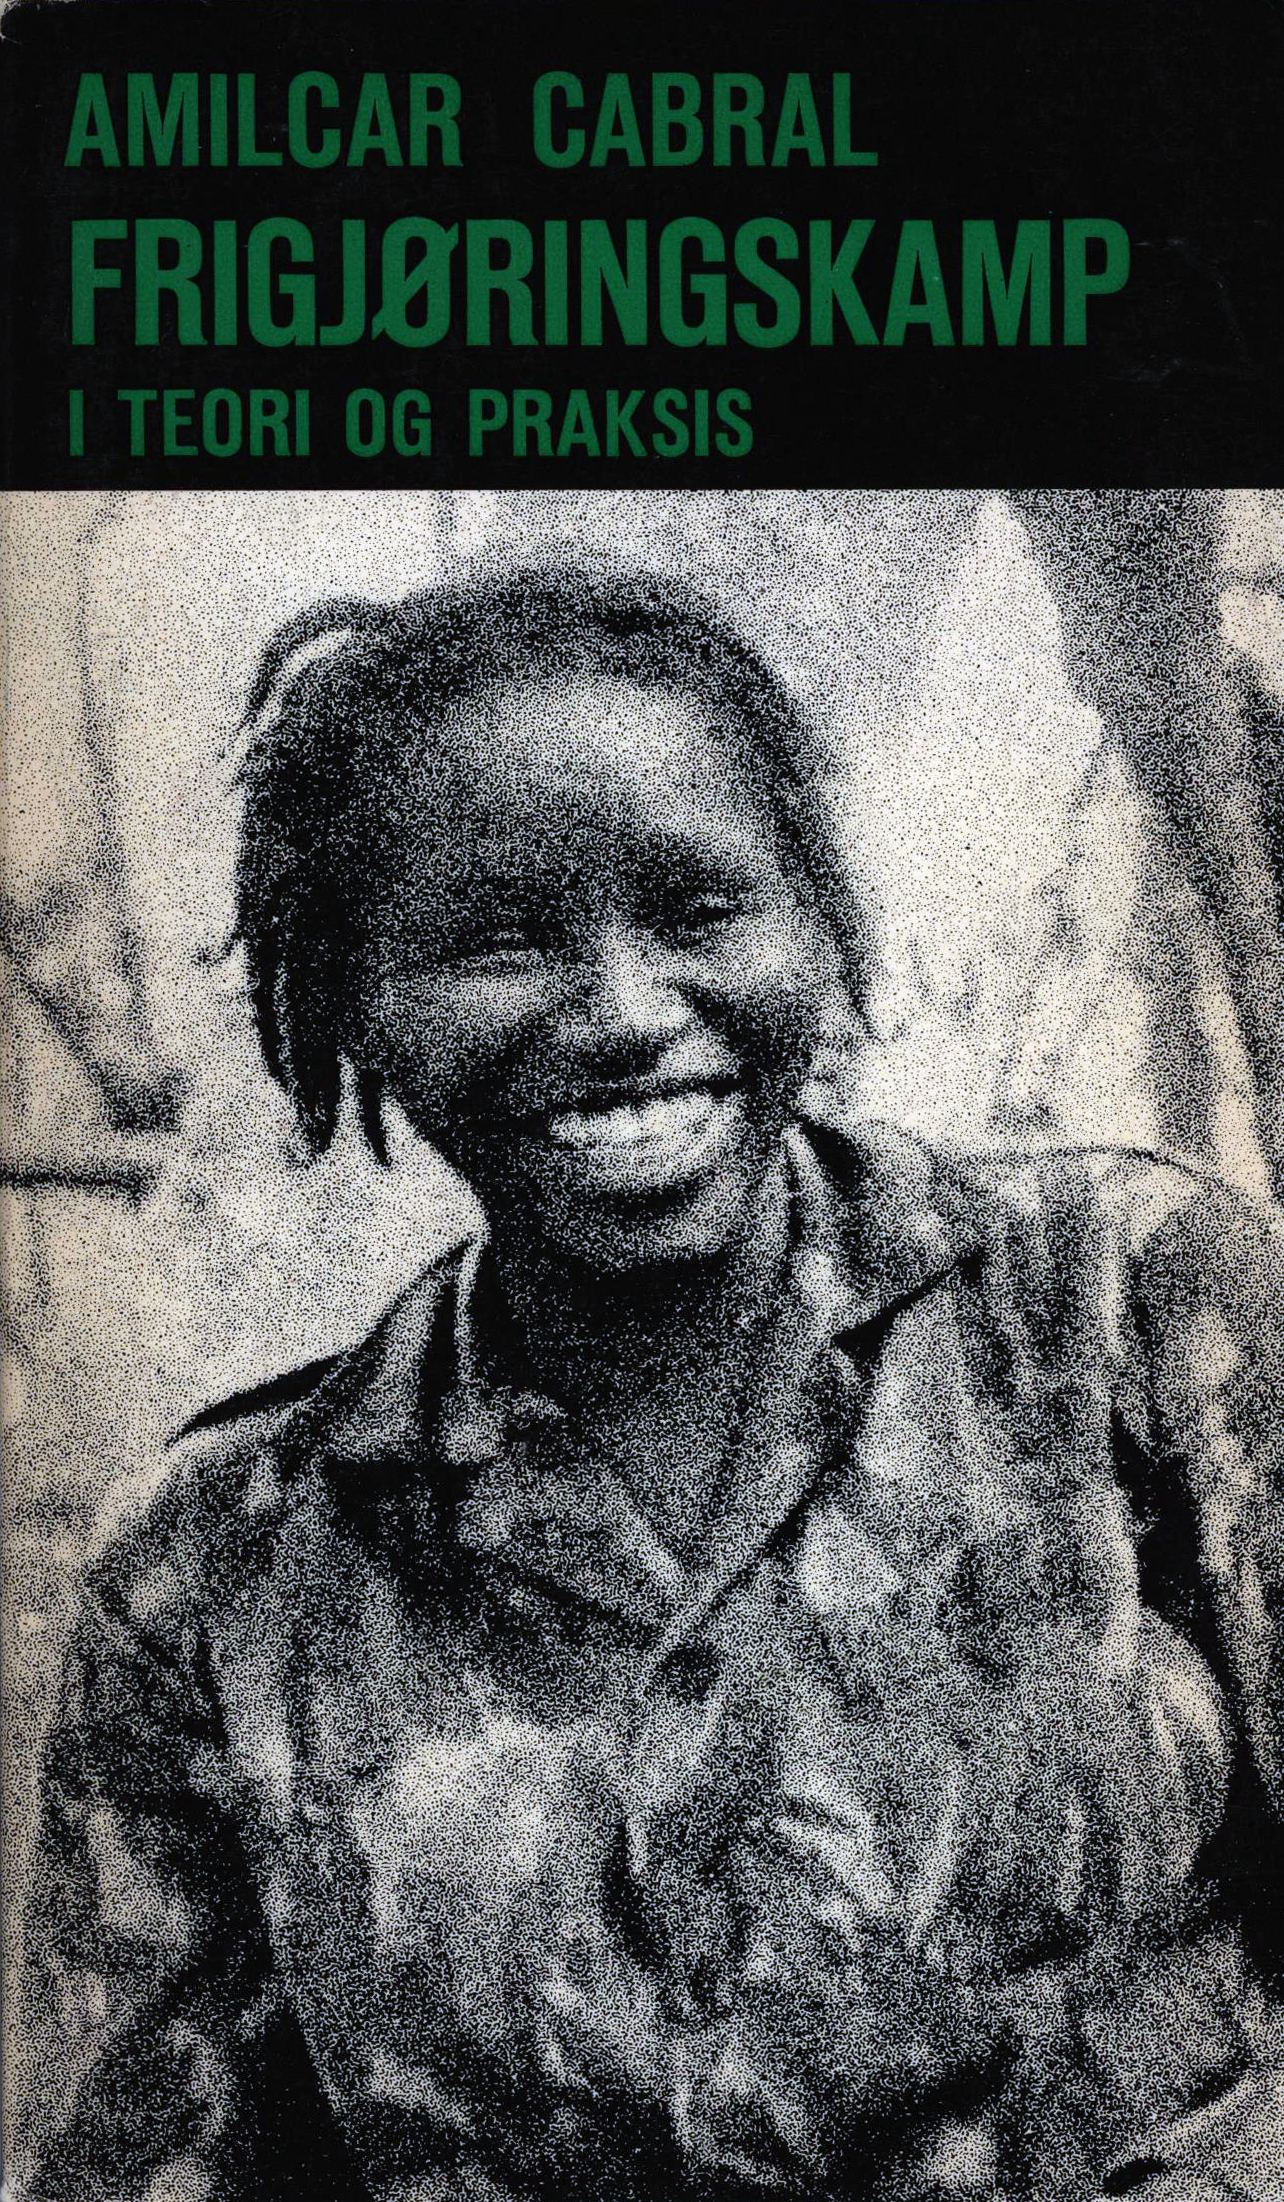 Amilcar Cabral: Frigjøringskamp i teori og praksis